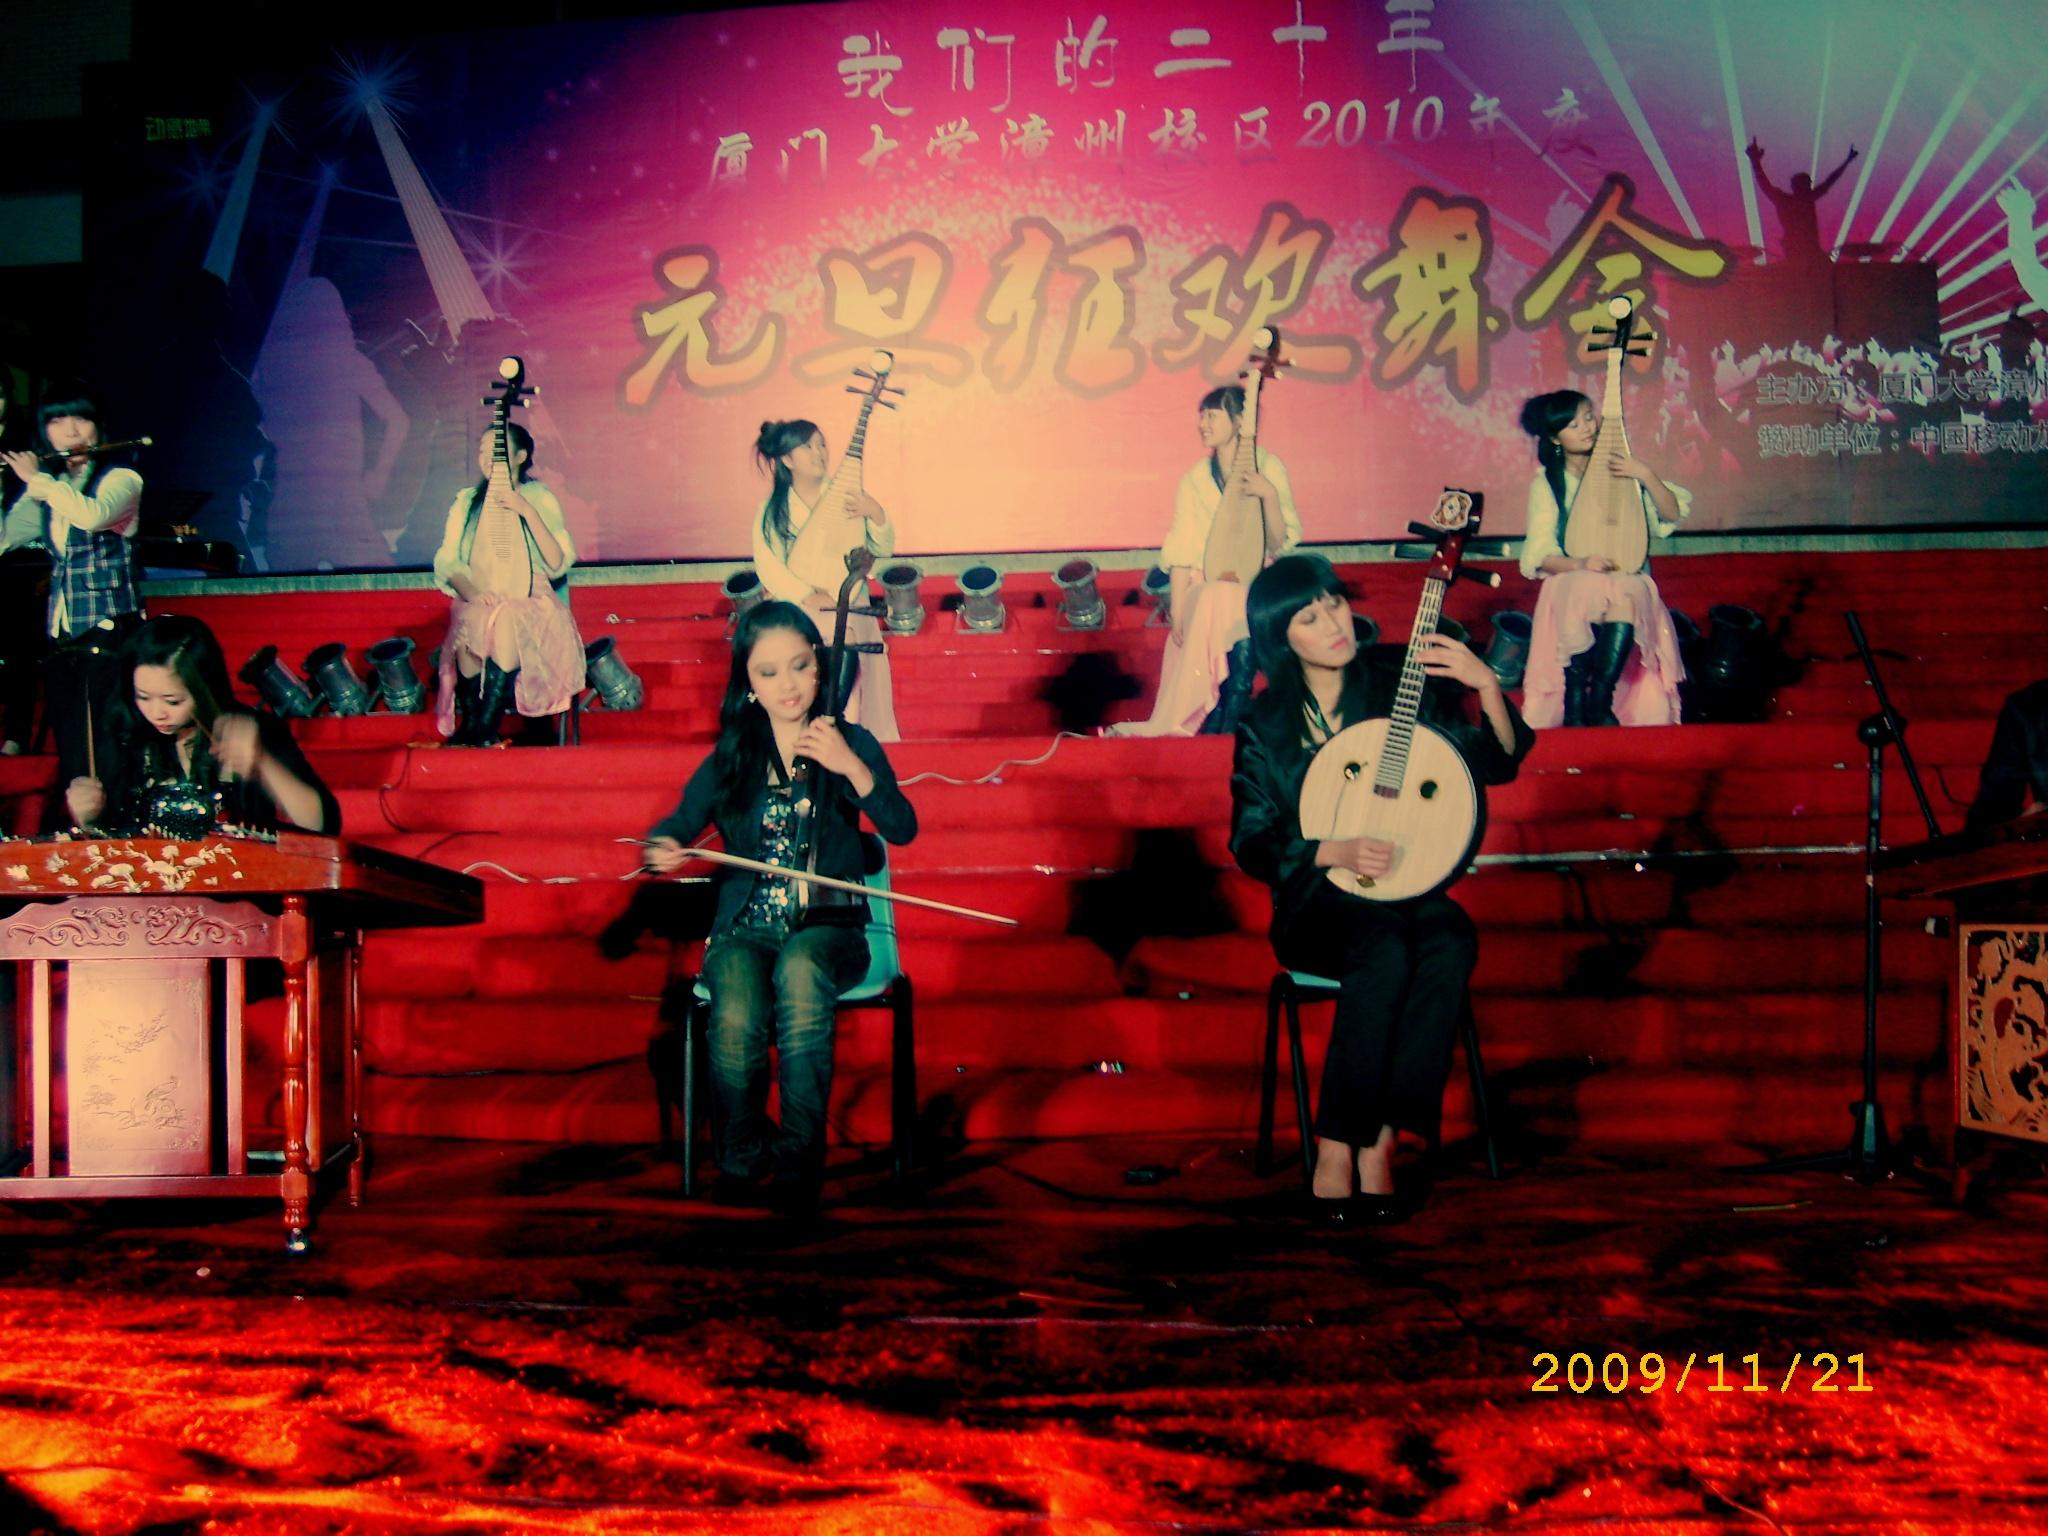 Concert at Xiamen University